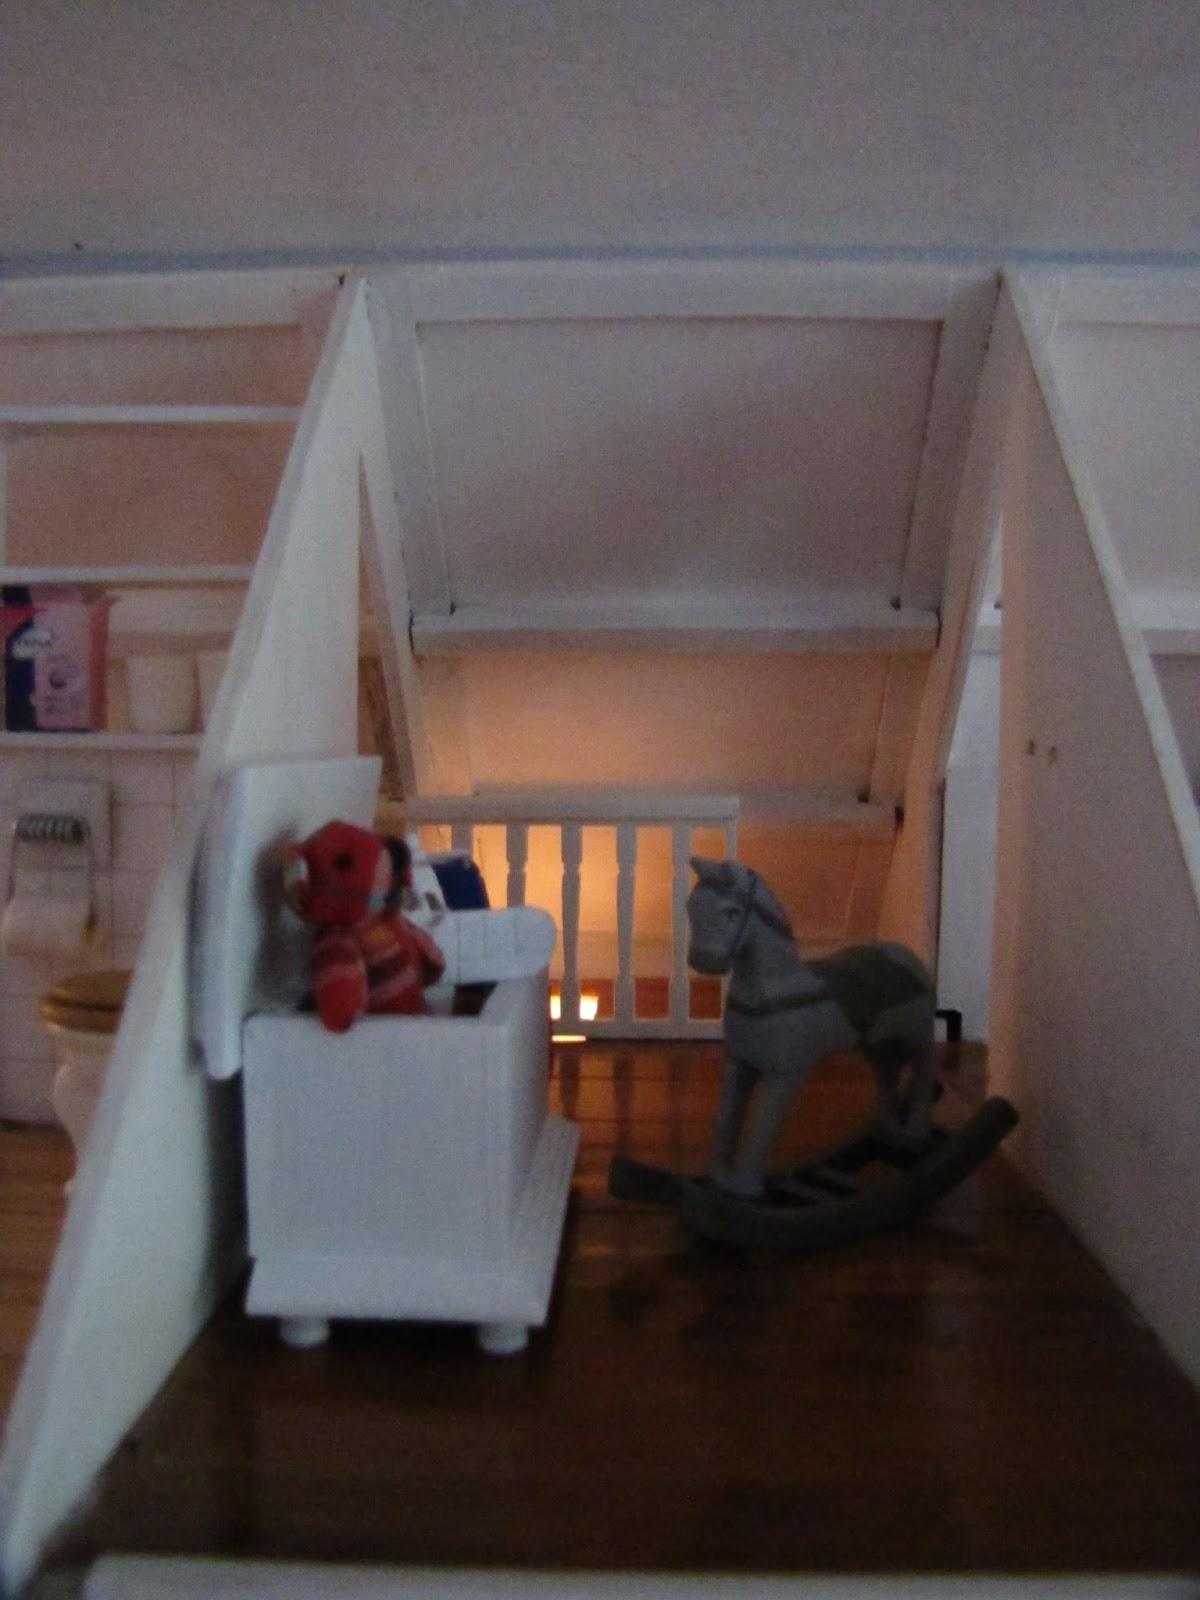 Paulas minis augustus 2013 - Geschilderd slaapkamer model ...